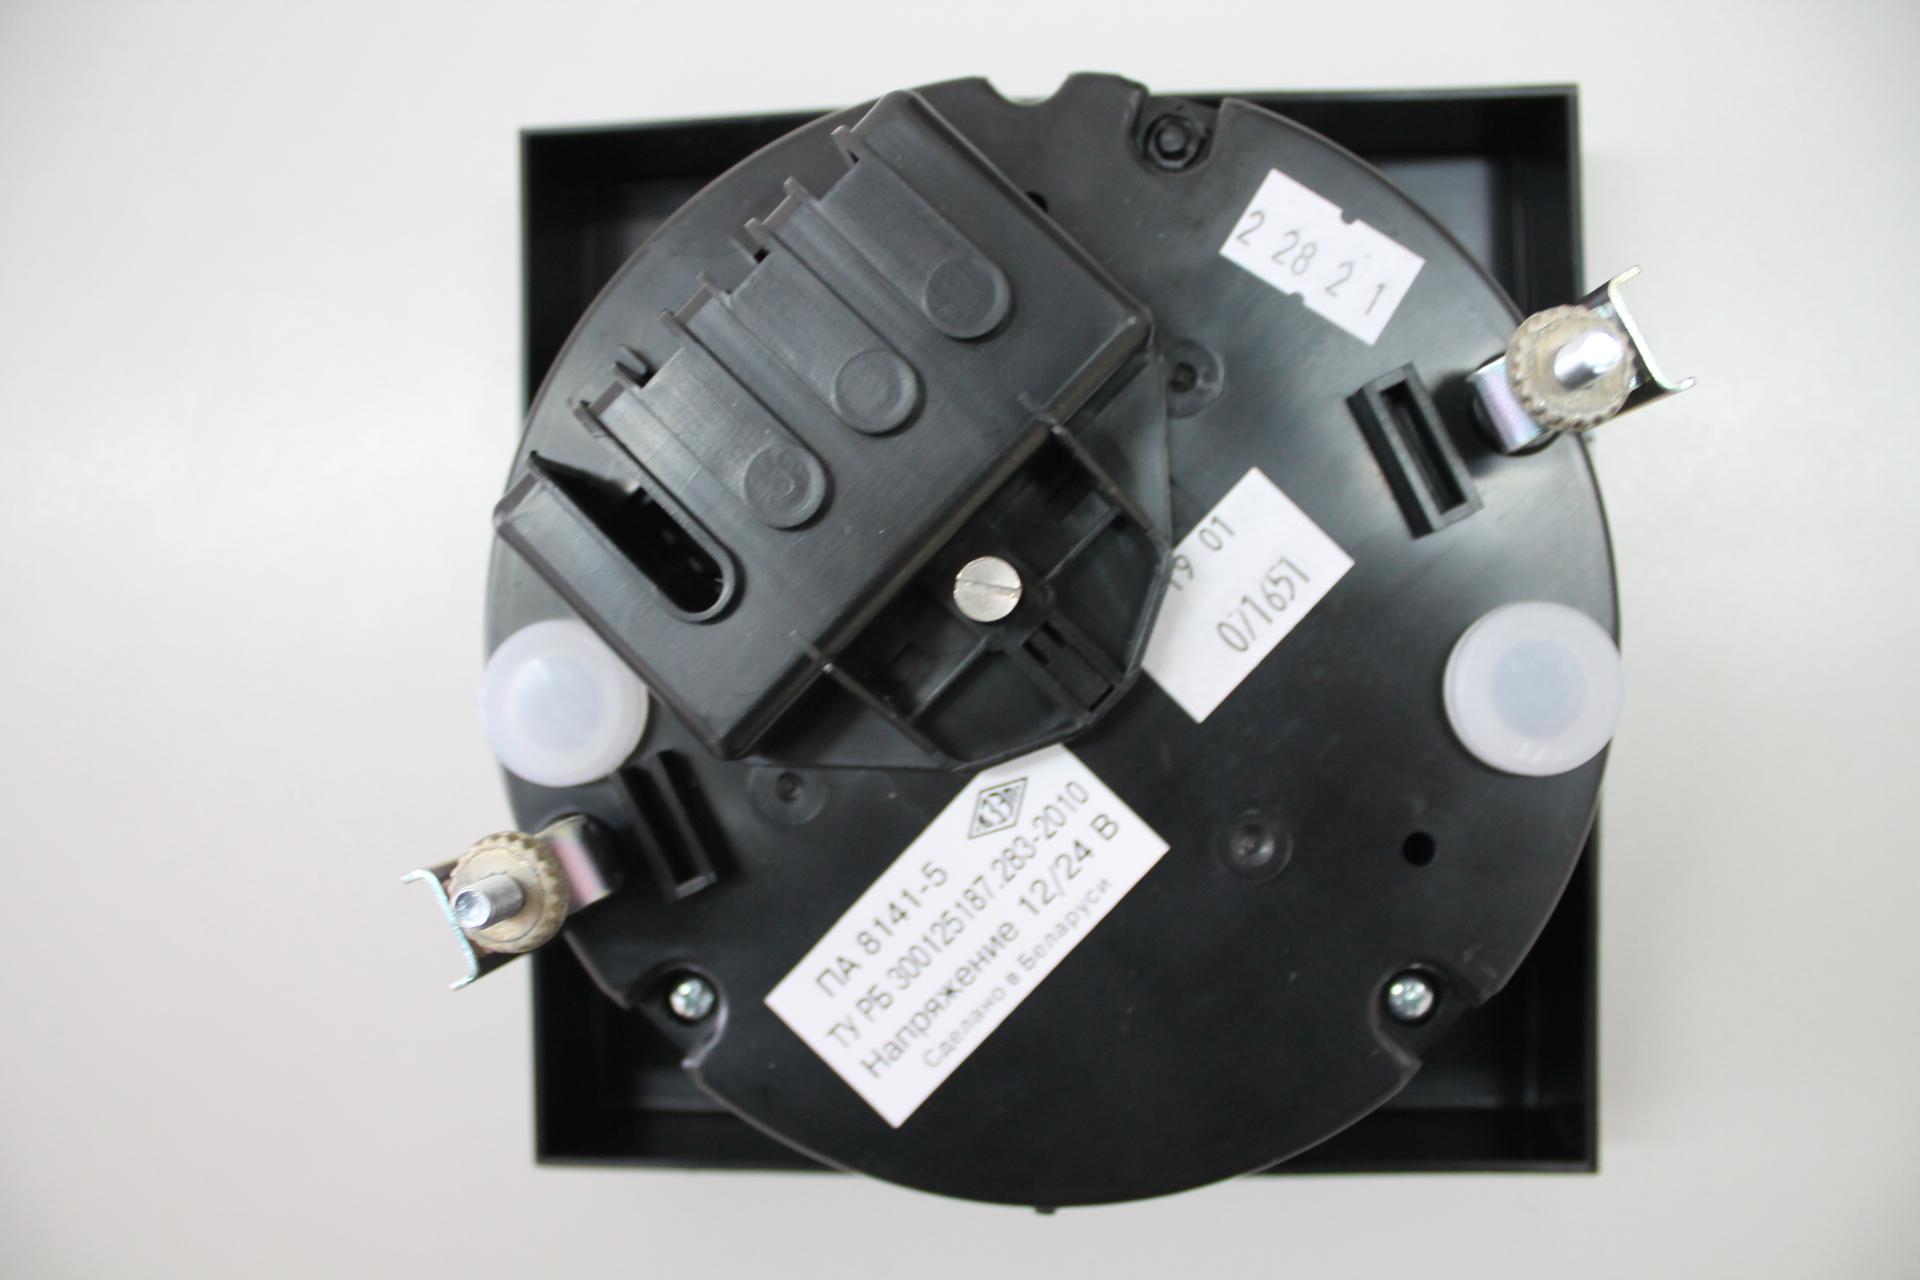 картинка Указатель скорости ПА 8141-5 (спидометр) от центра оснащения СОНАР в Омске